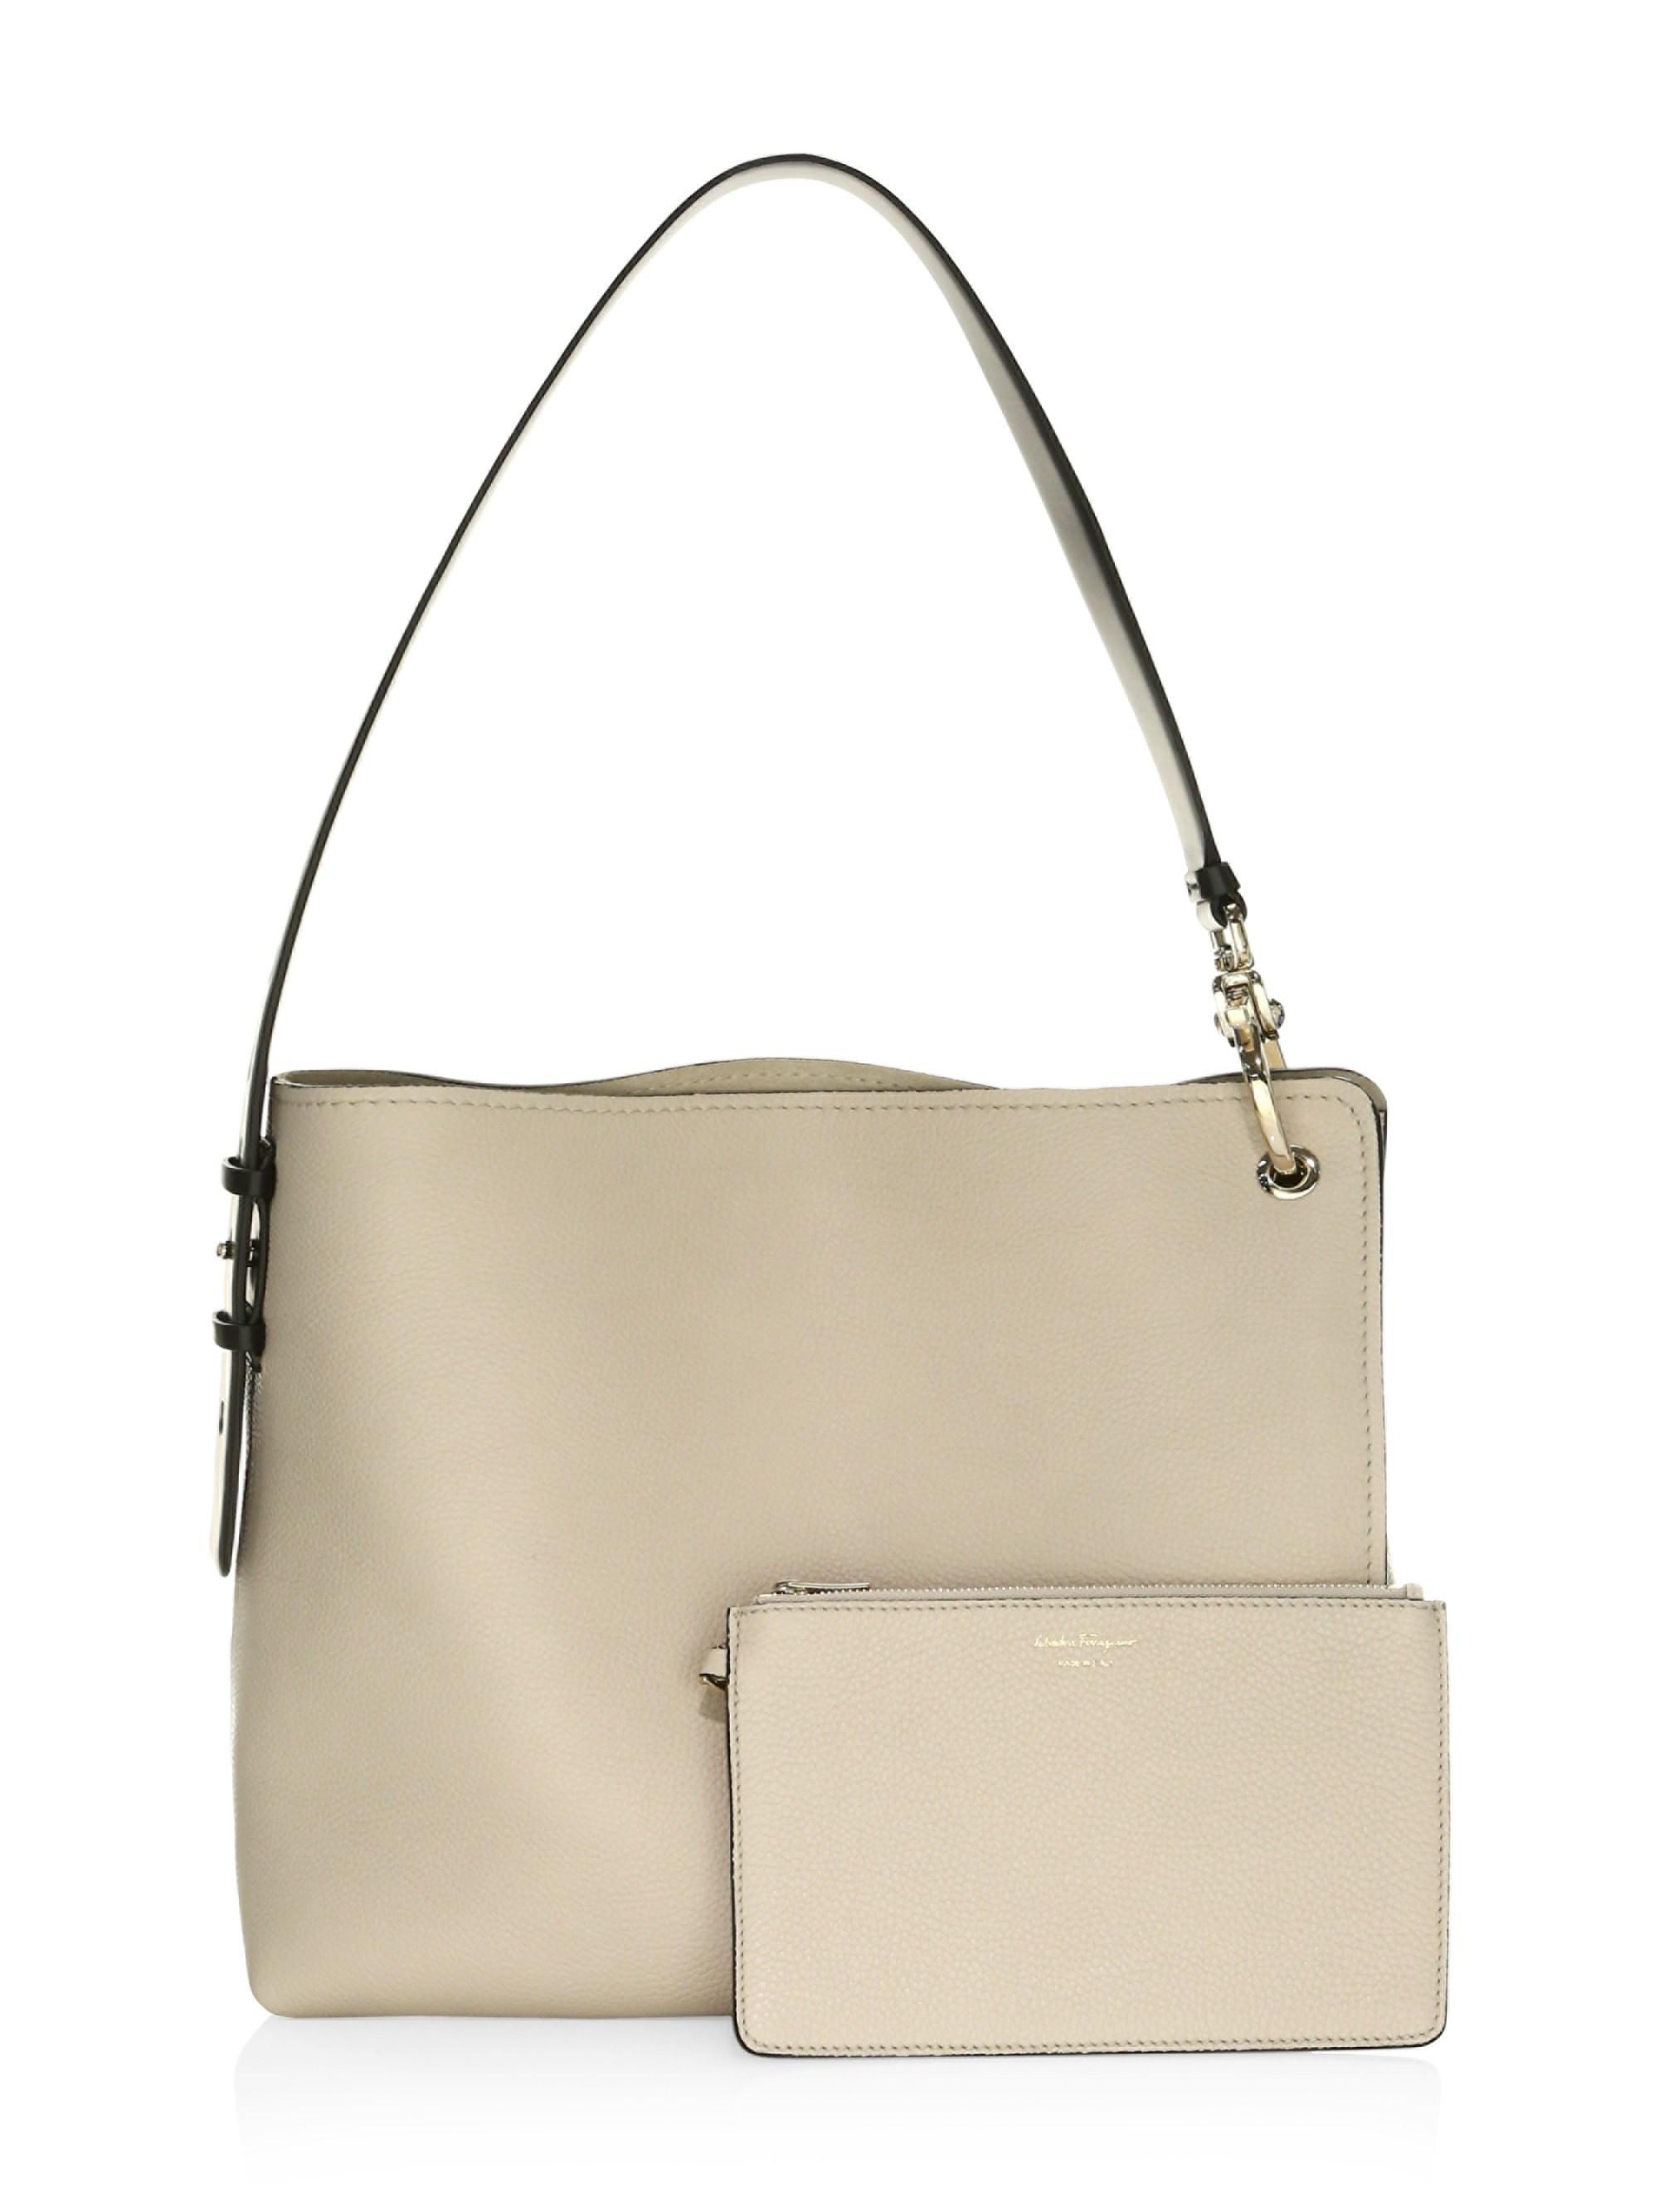 Lyst - Ferragamo Medium Minerva Leather Hobo Bag 426522c85e5b6